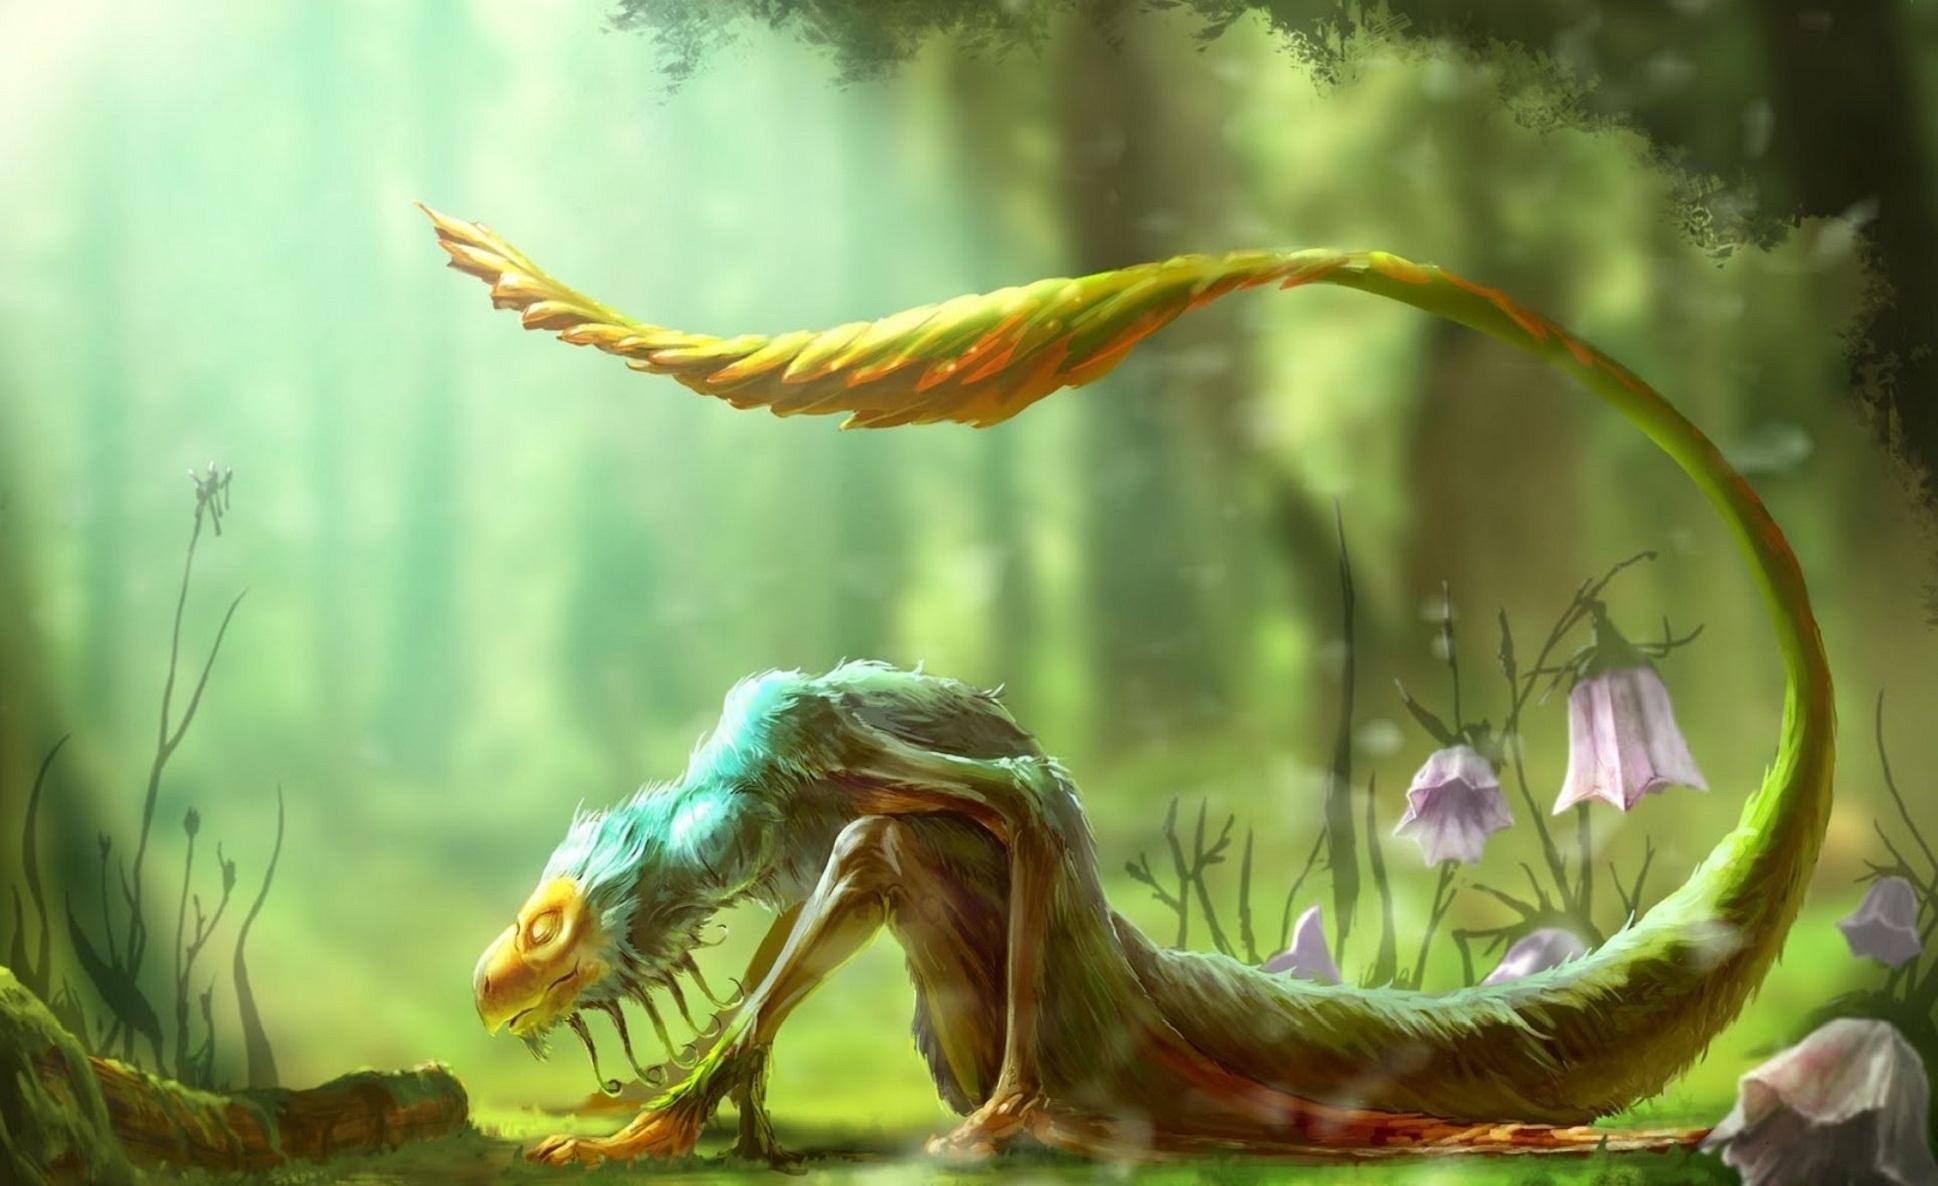 Fantasy forest creatures